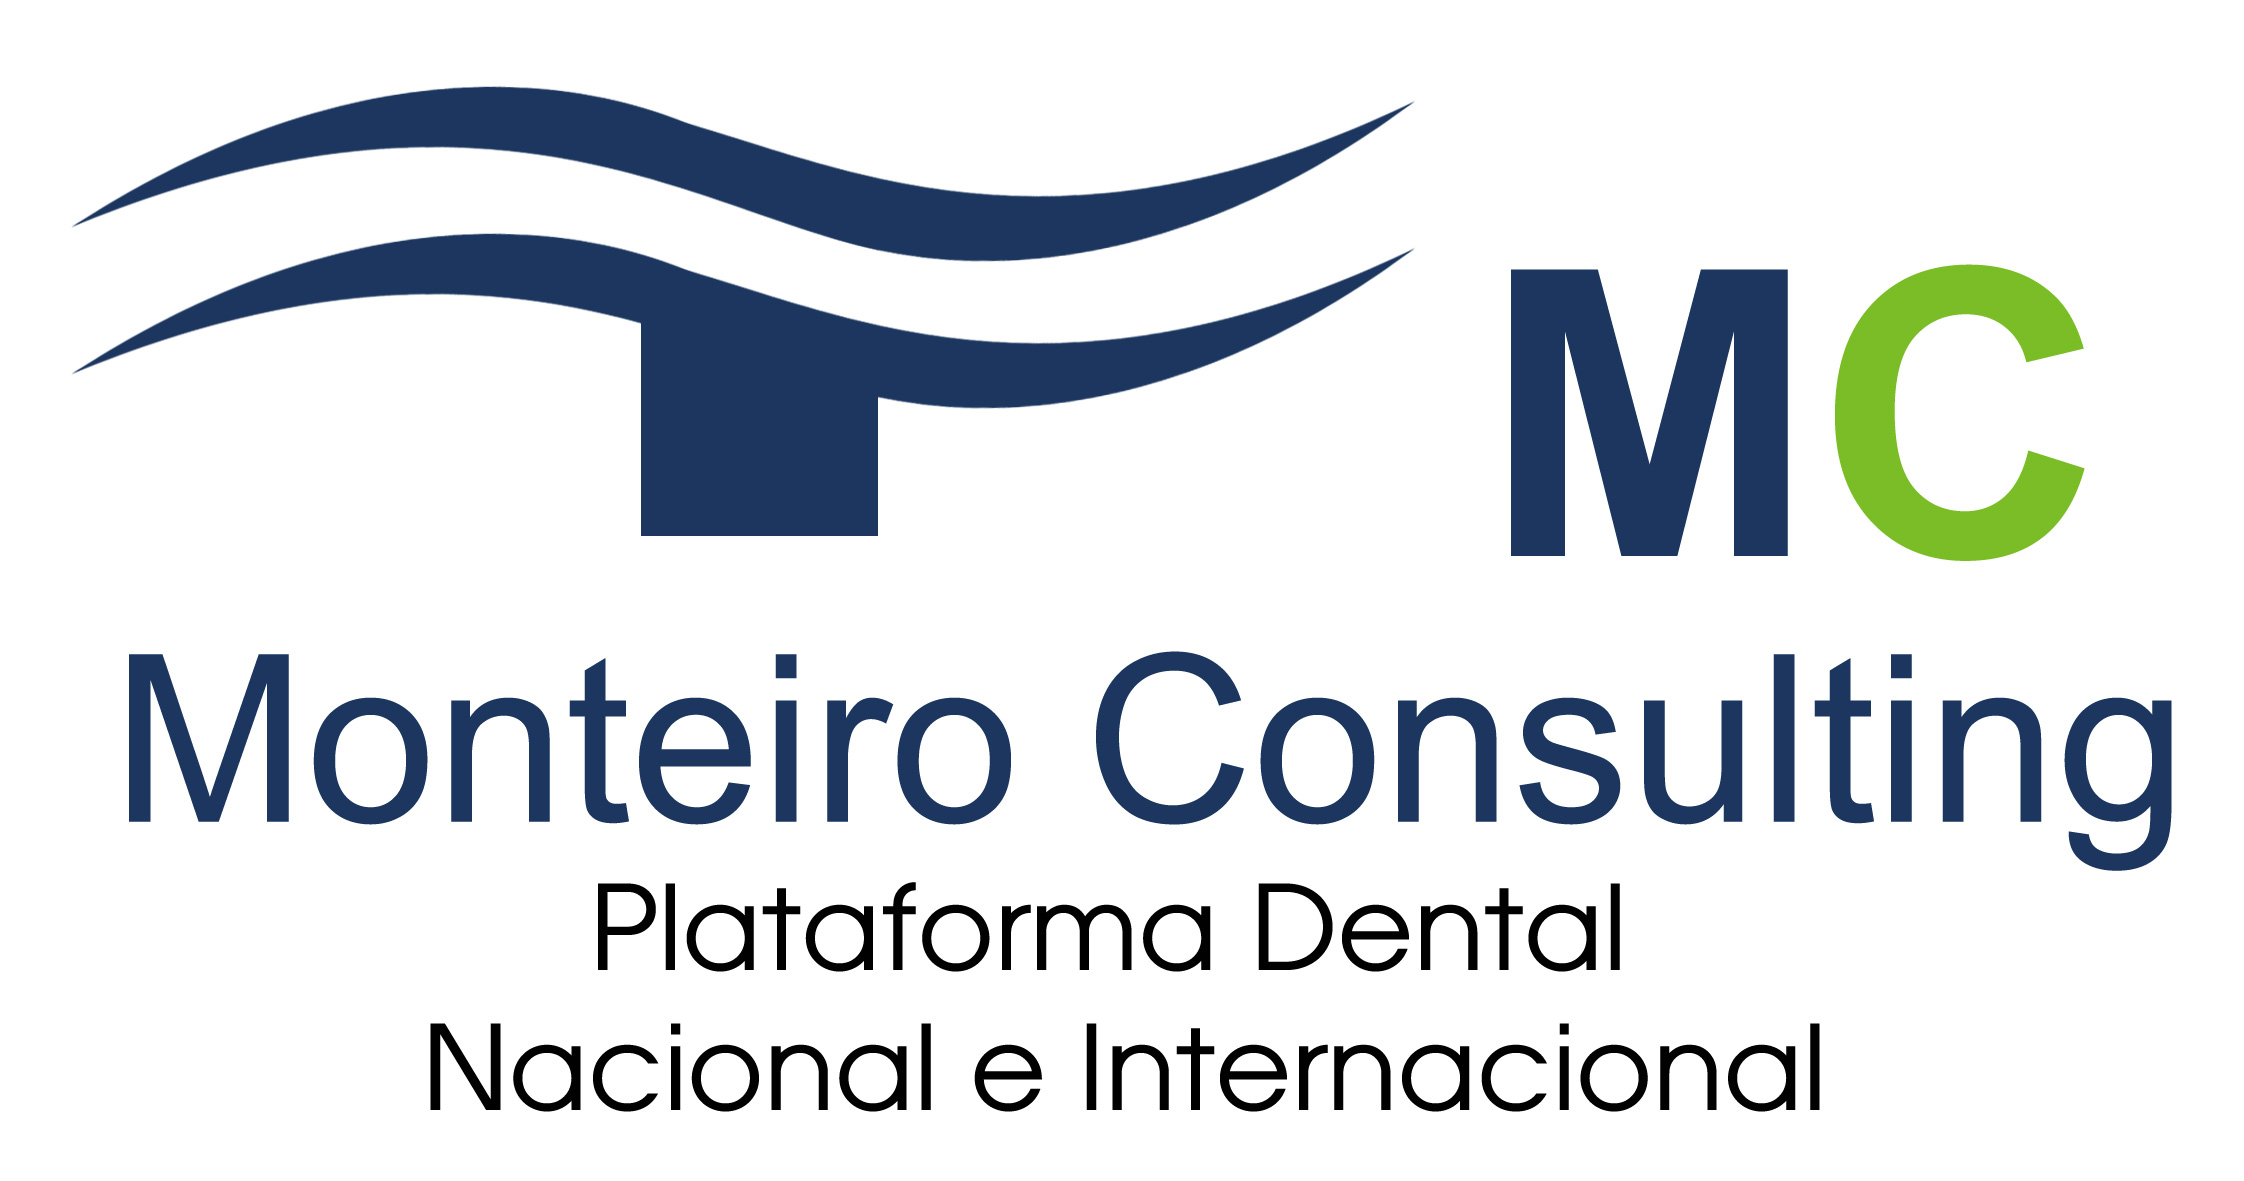 Monteiro Consulting